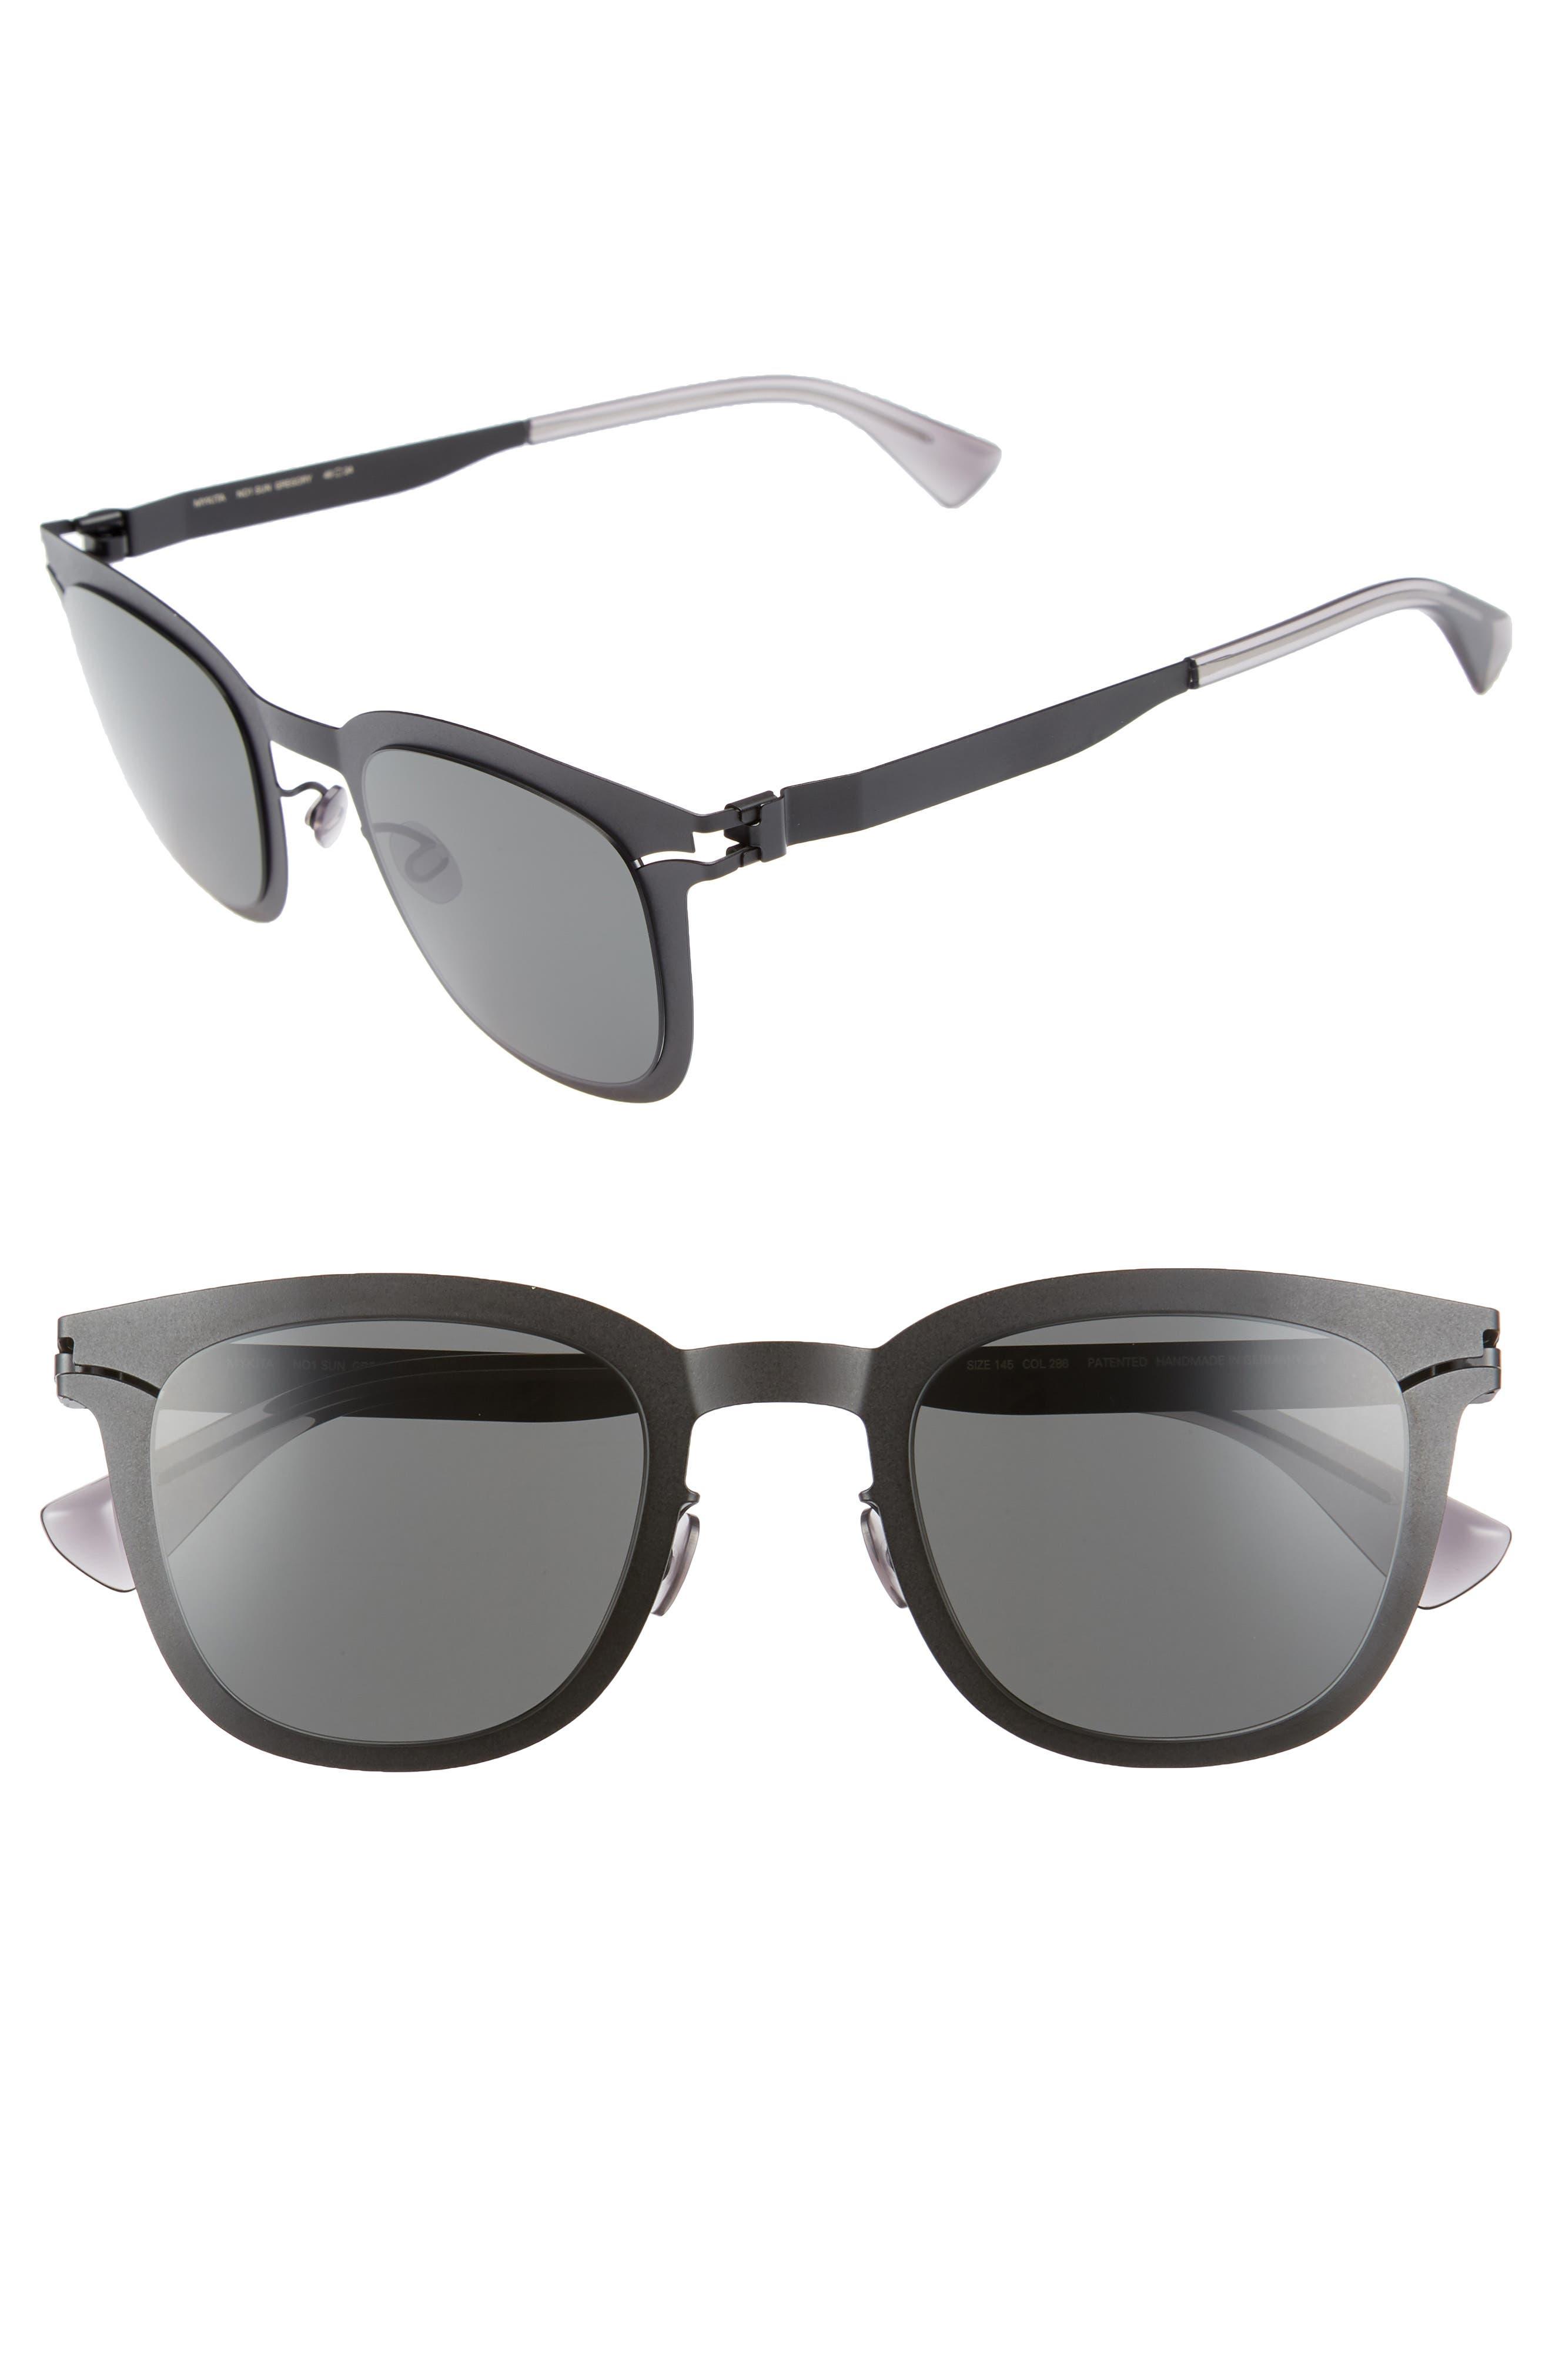 Gregory 49mm Sunglasses,                         Main,                         color, Matte Black